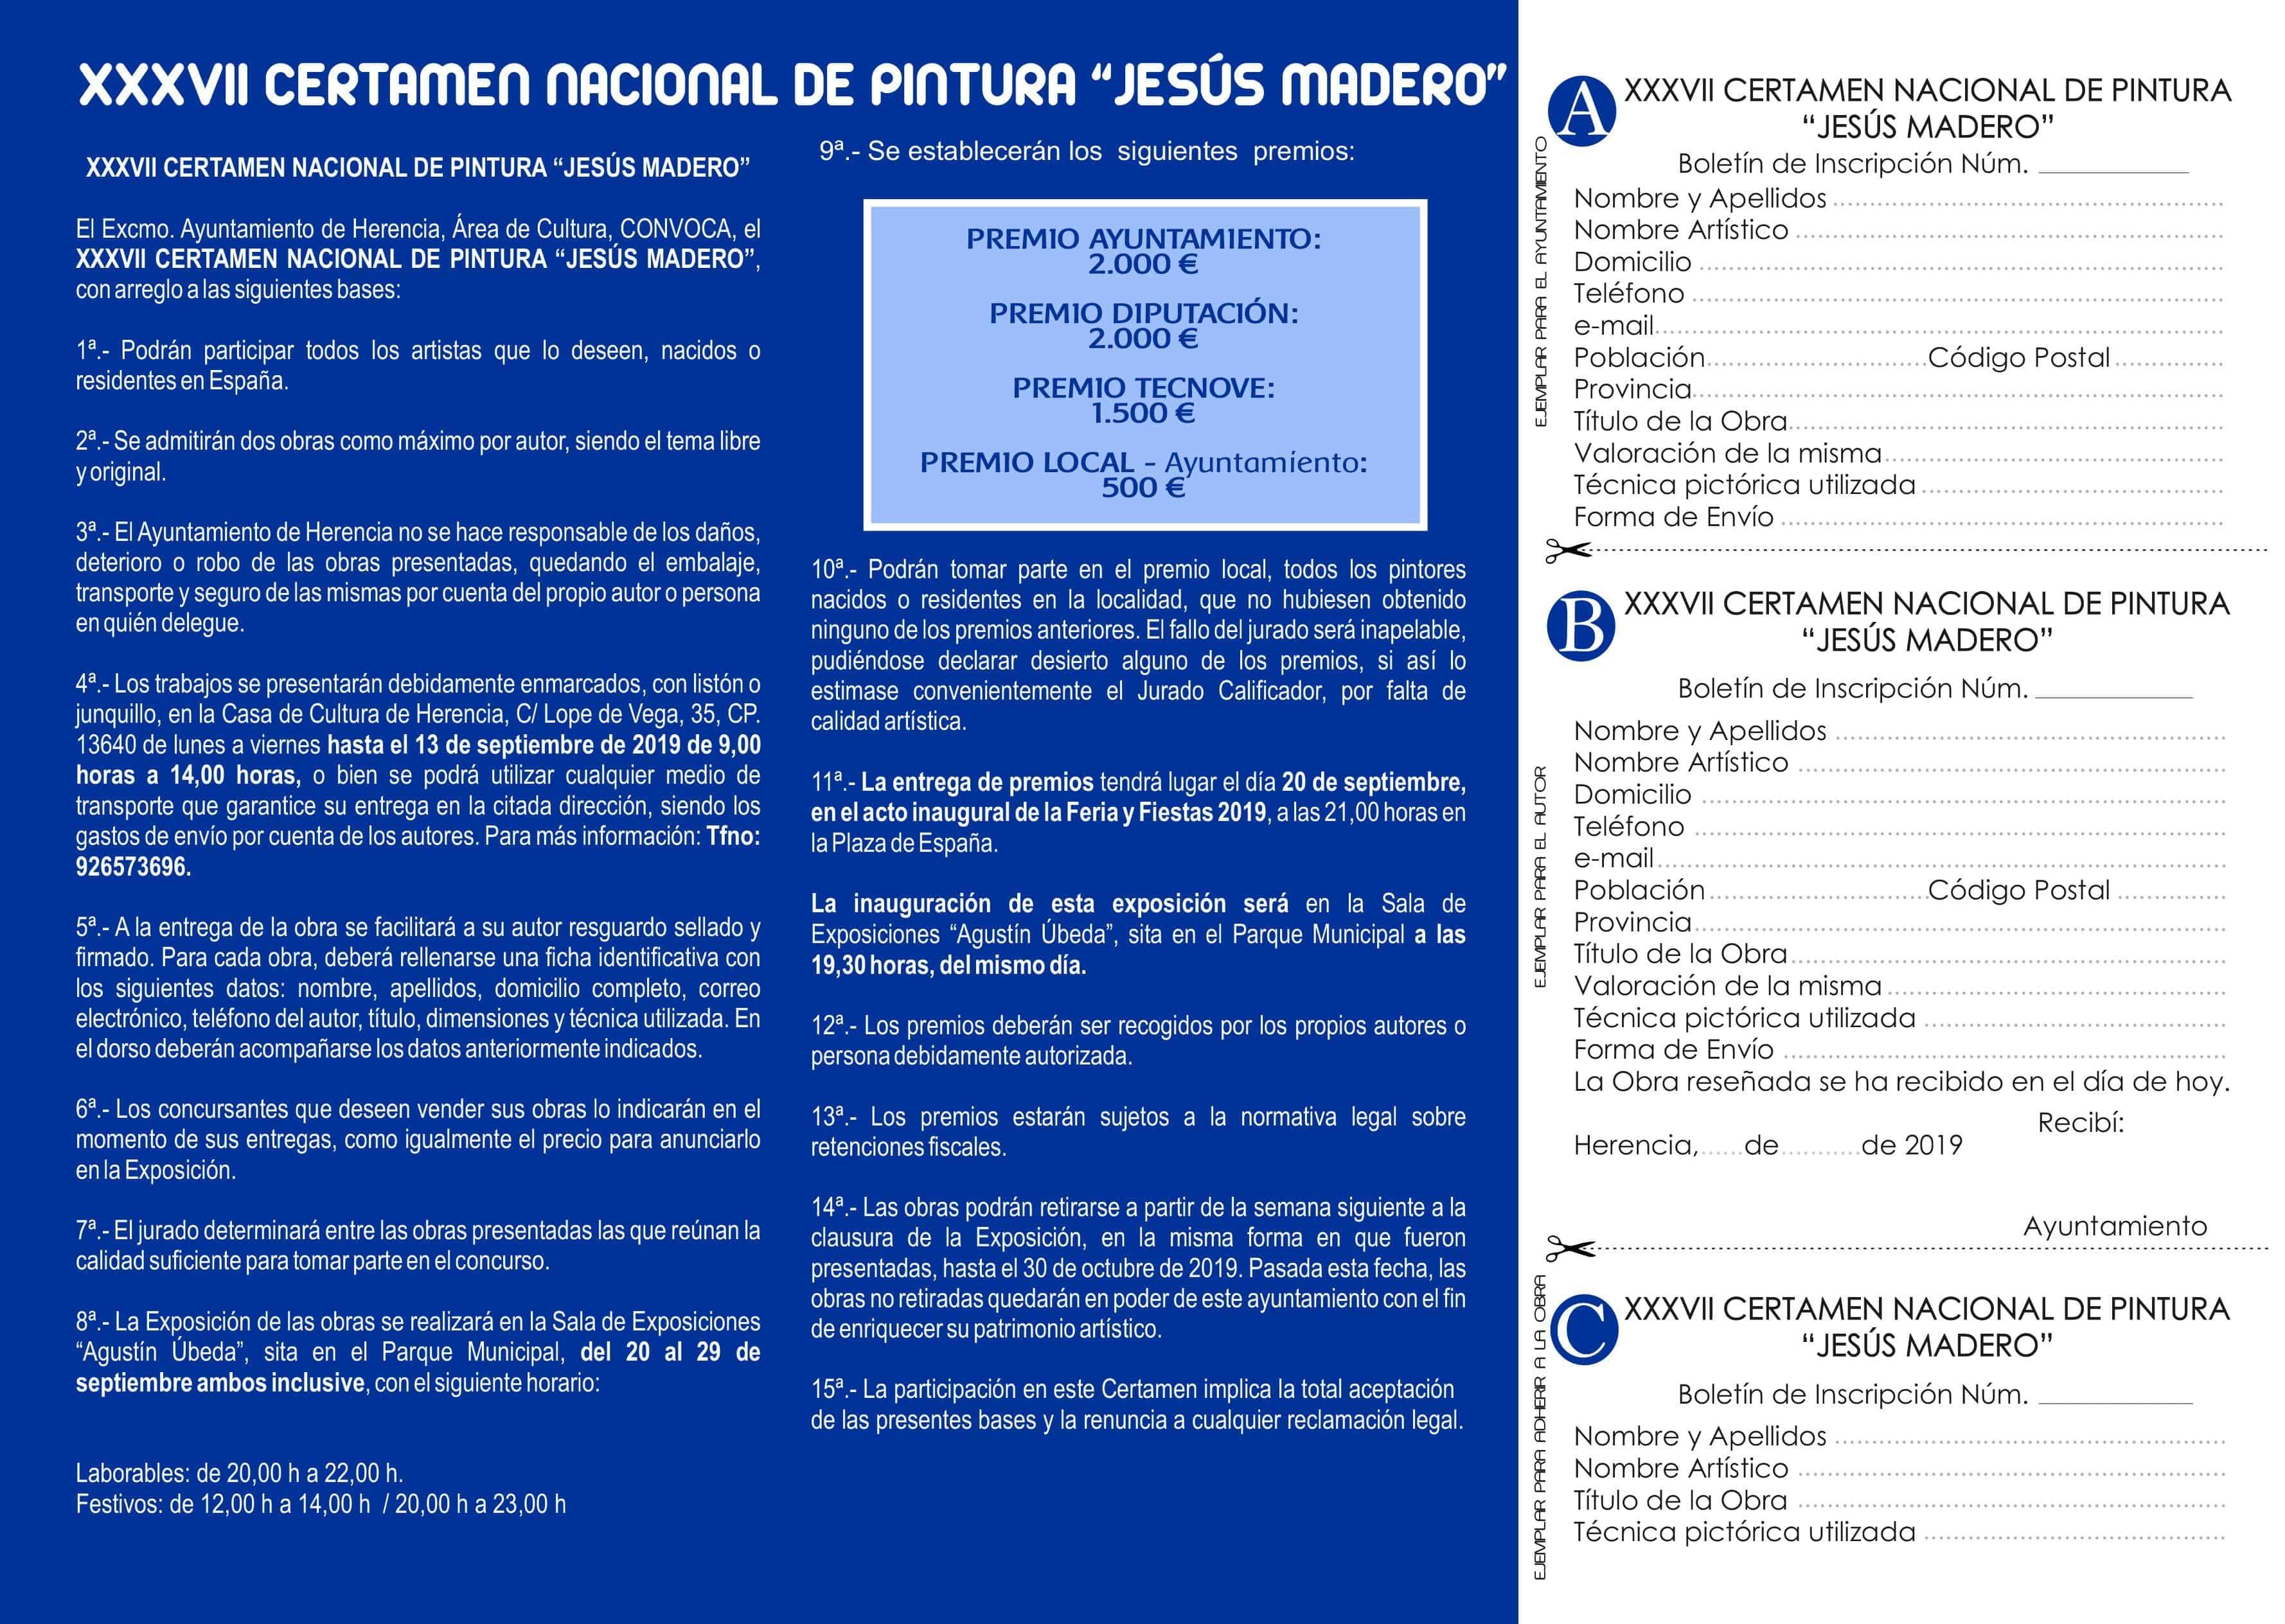 "Bases del Certamen Nacional de Pintura Jesus Madero 2 - Convocado el XXXVII Certamen Nacional de Pintura ""Jesús Madero"""